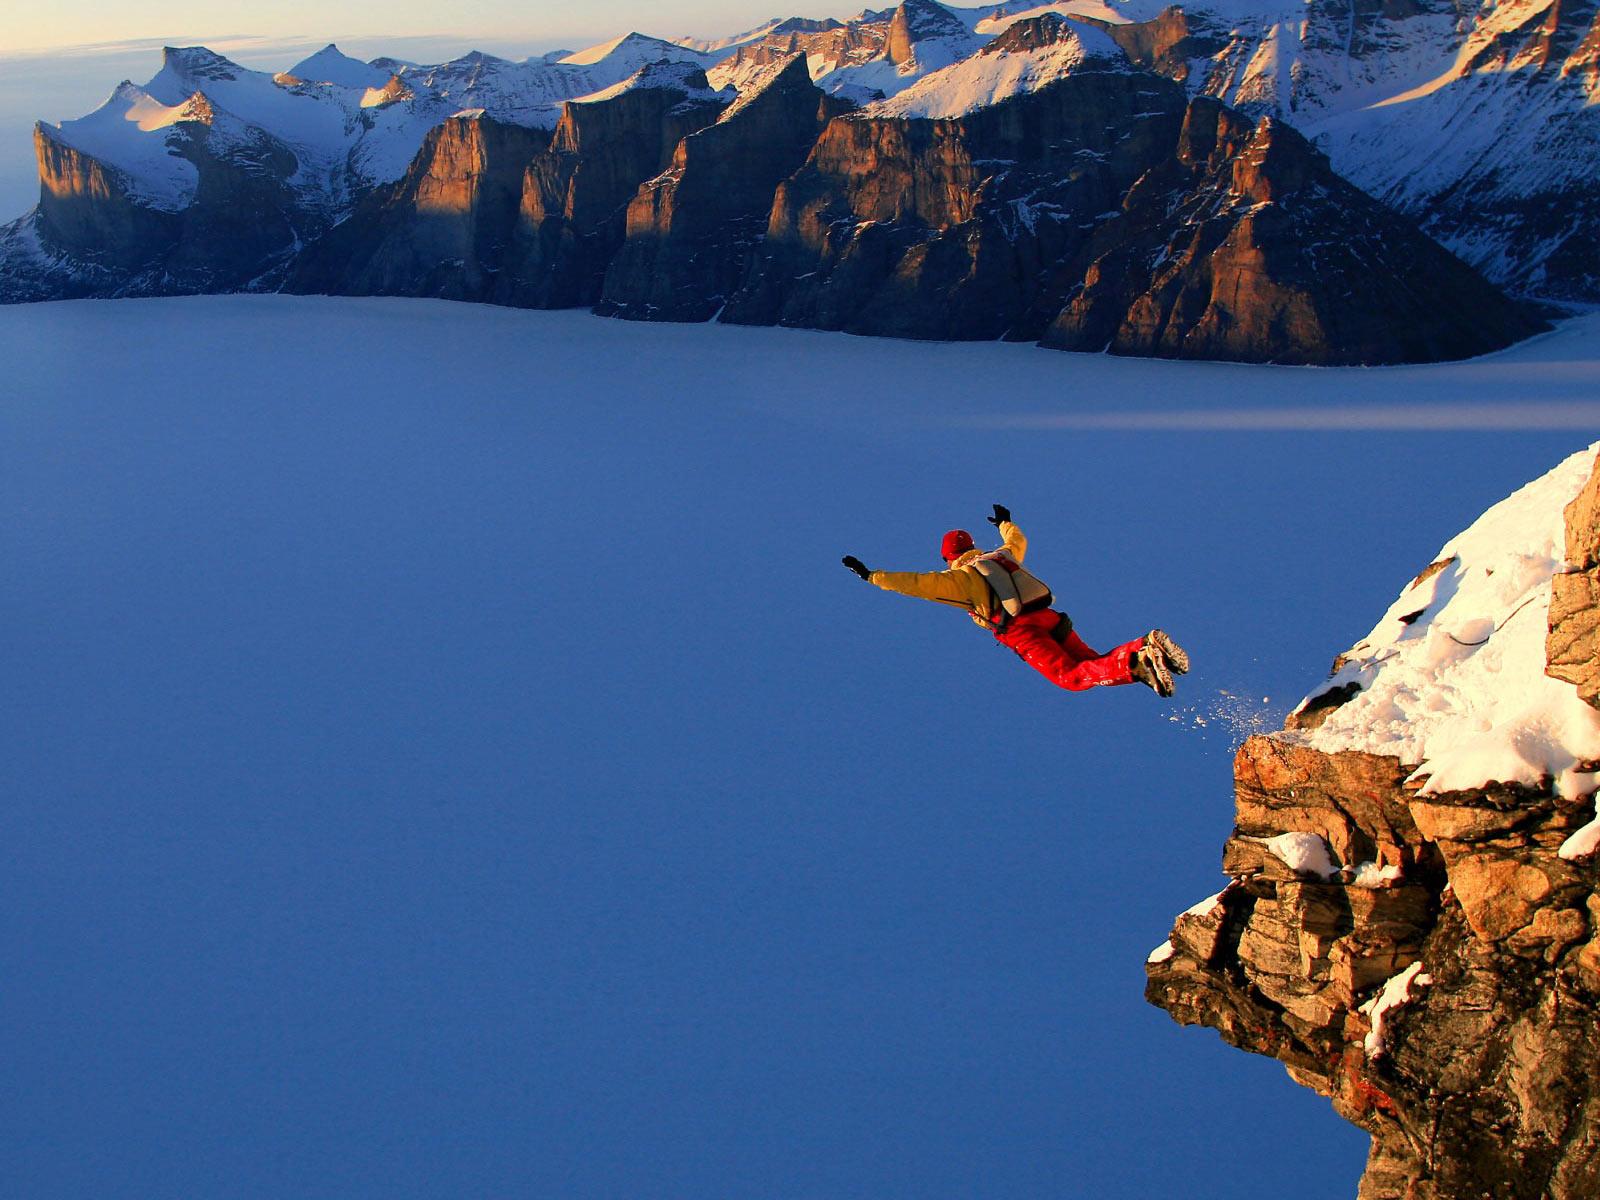 https://4.bp.blogspot.com/-uQSc86PsKHI/Tlxs_xaeB3I/AAAAAAAABXQ/HNkJdv6g_R8/s1600/Extreme_sport_from_rock_climbing_to_mountain_parachuting.jpg